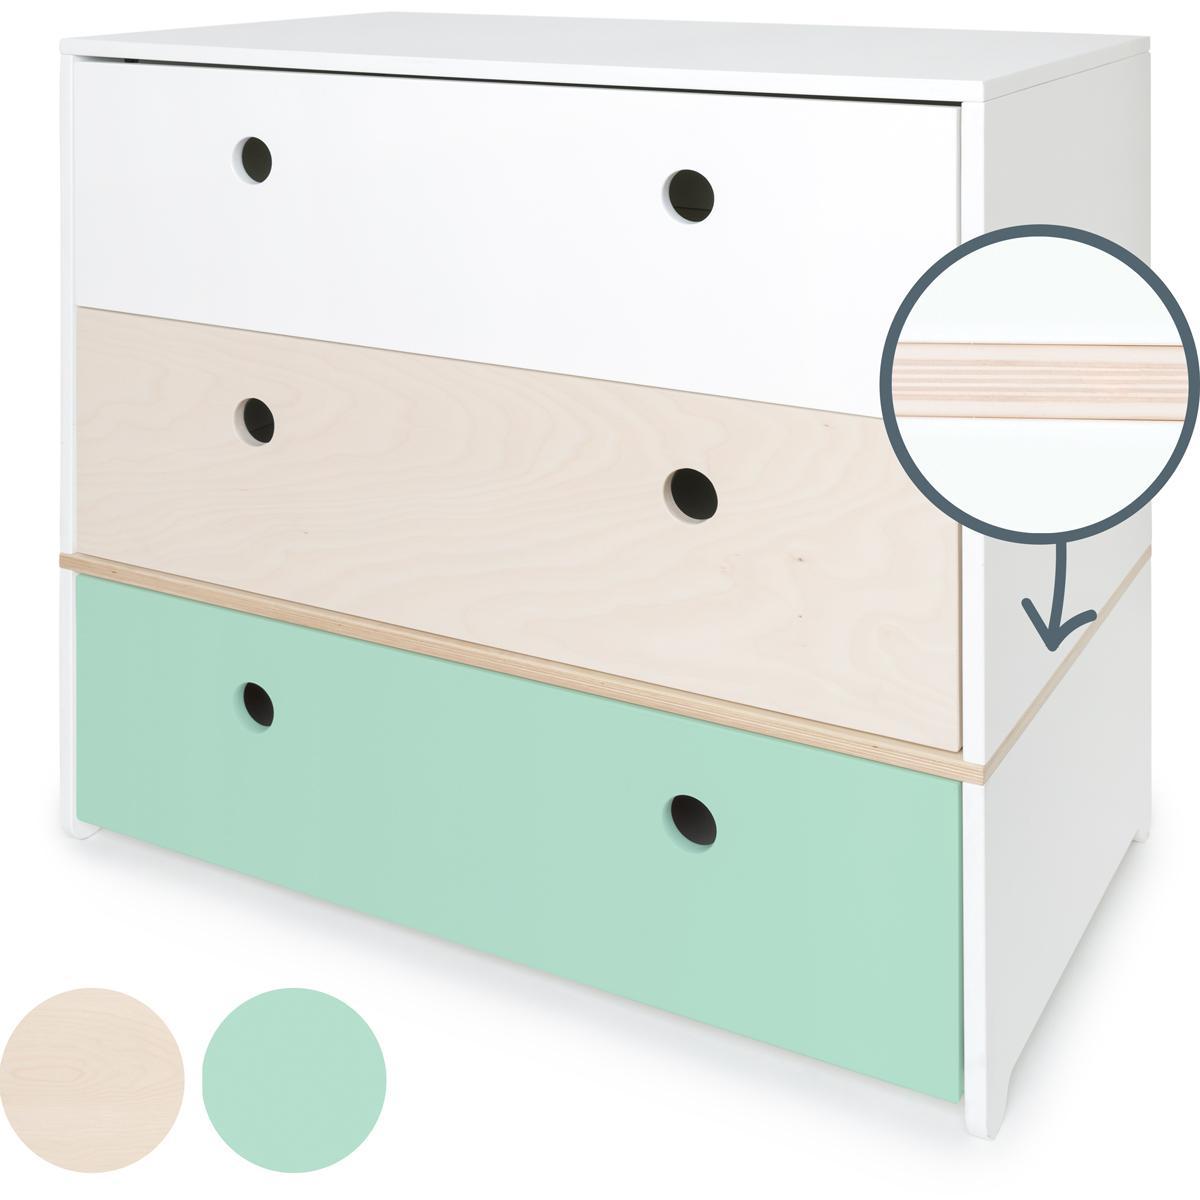 Kommode COLORFLEX Schubladen Farben white-white wash-mint